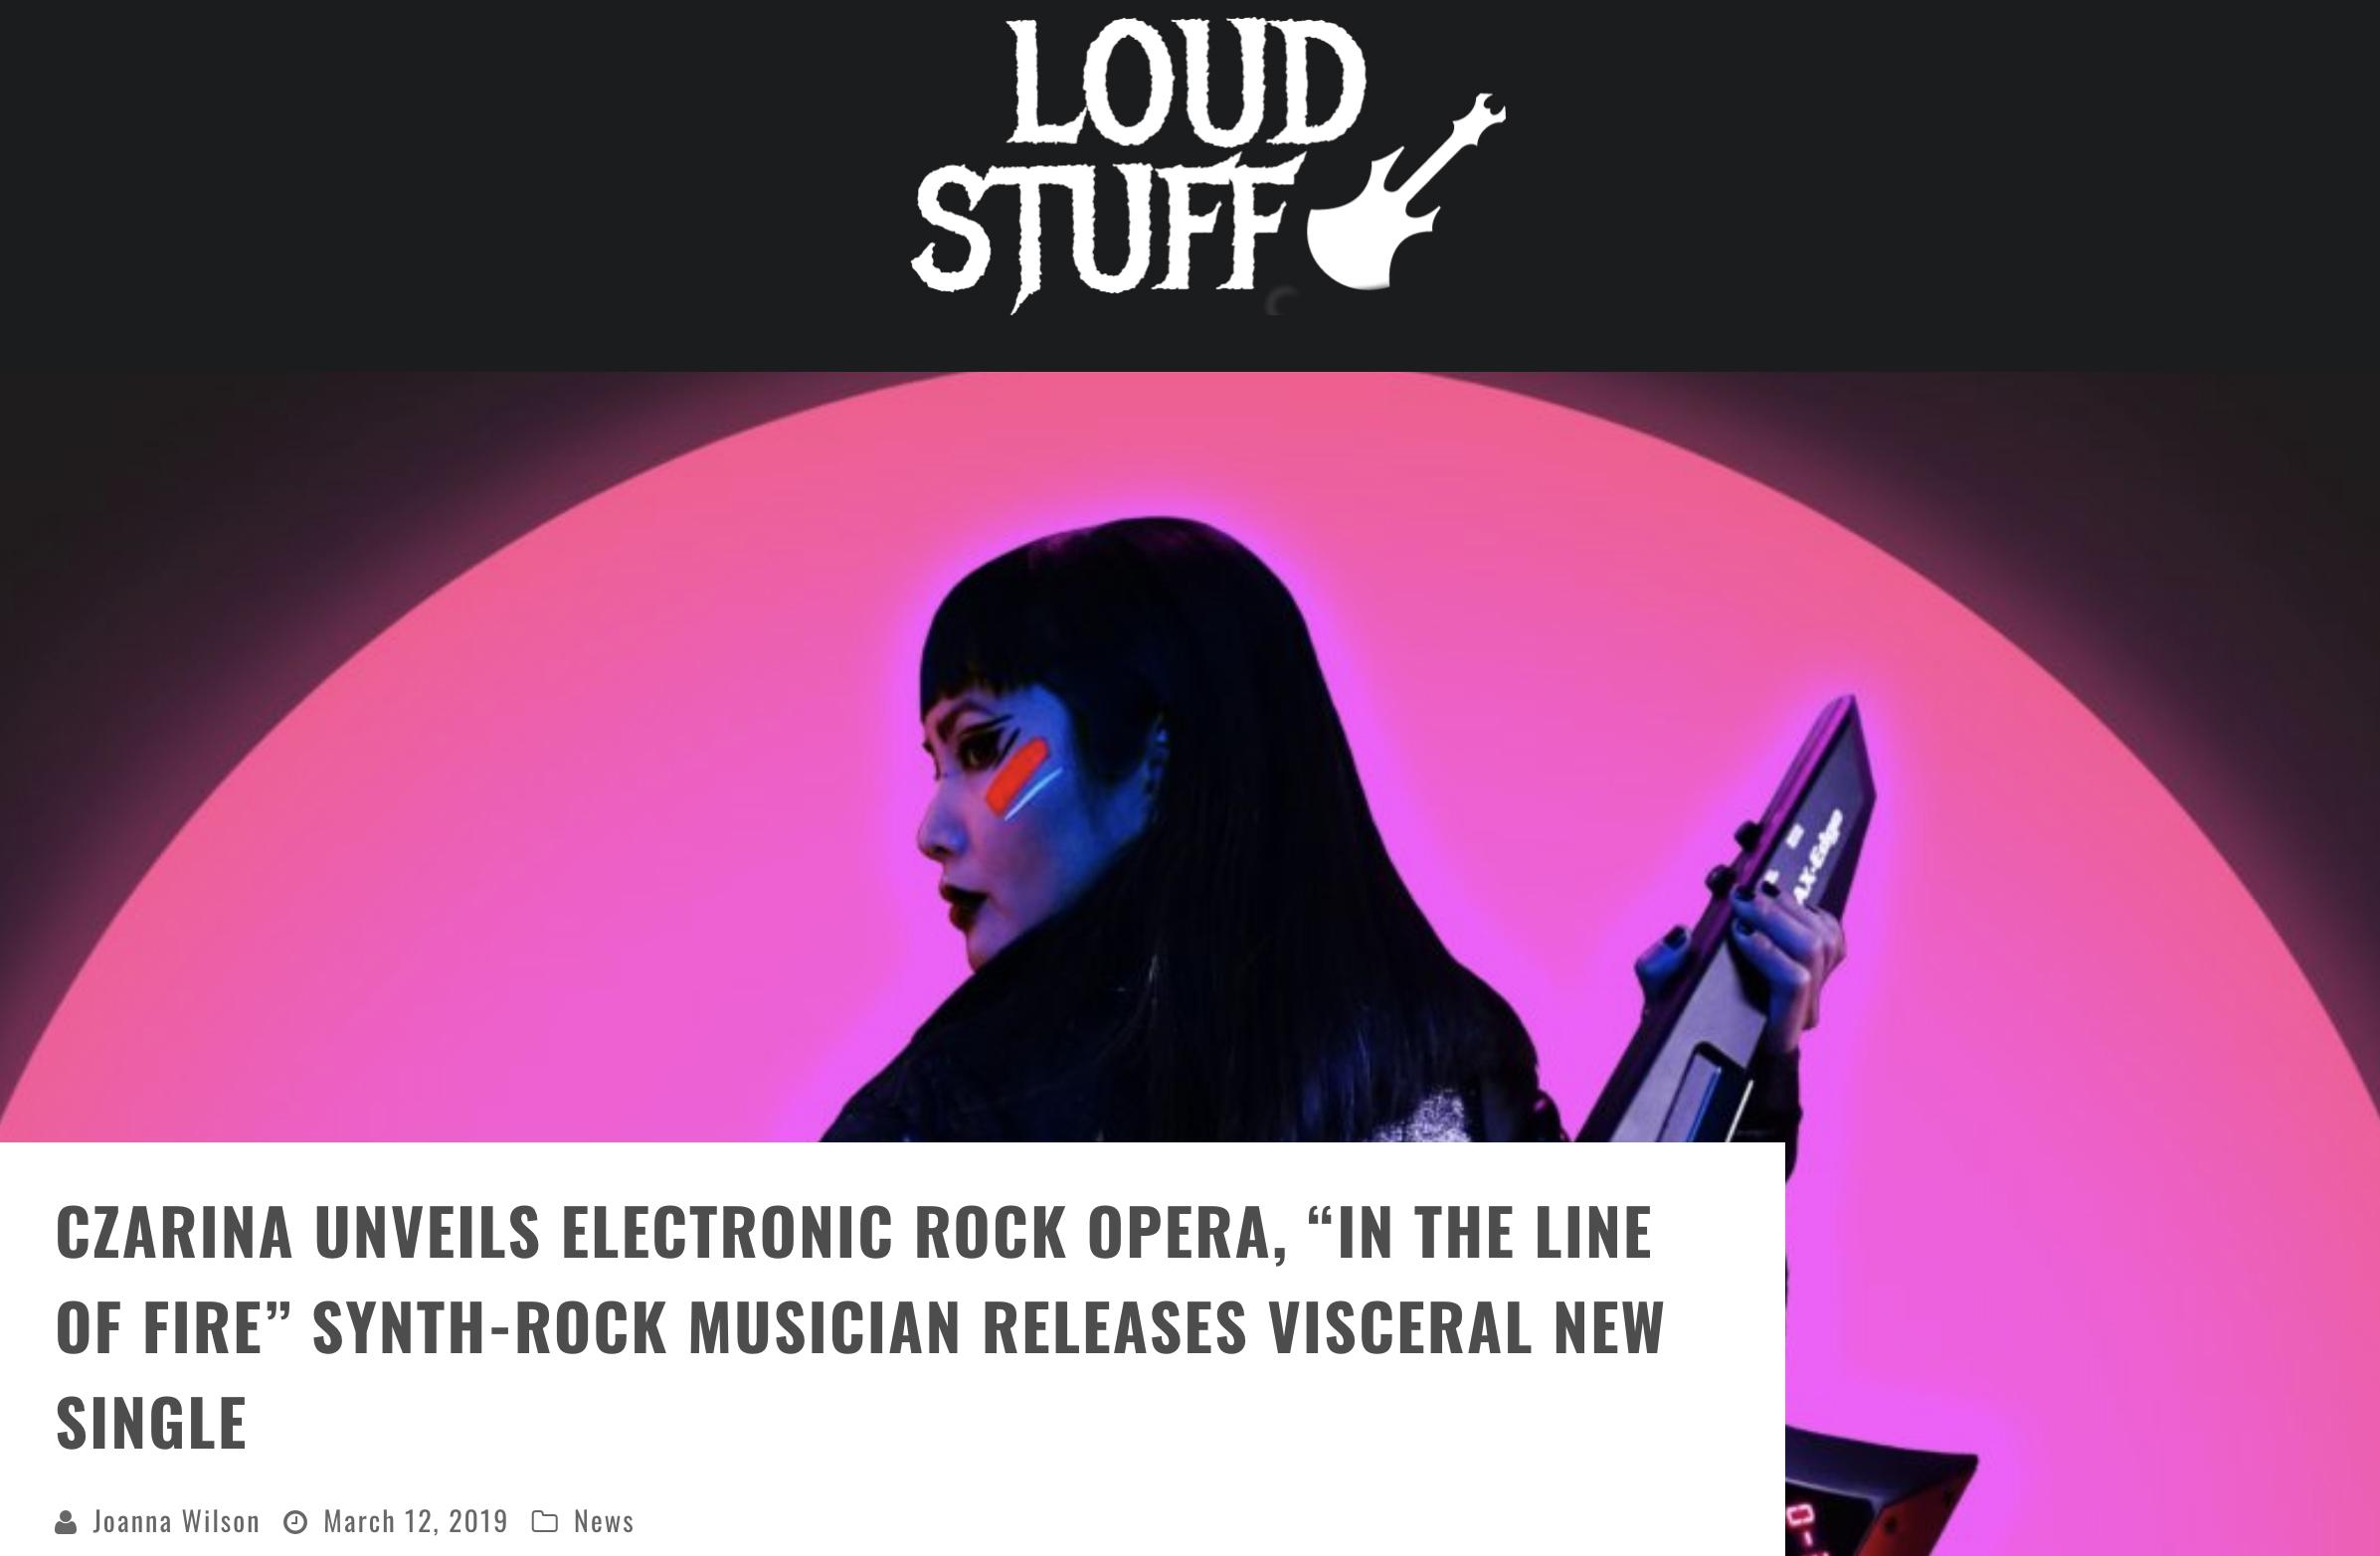 LoudStuff.jpg